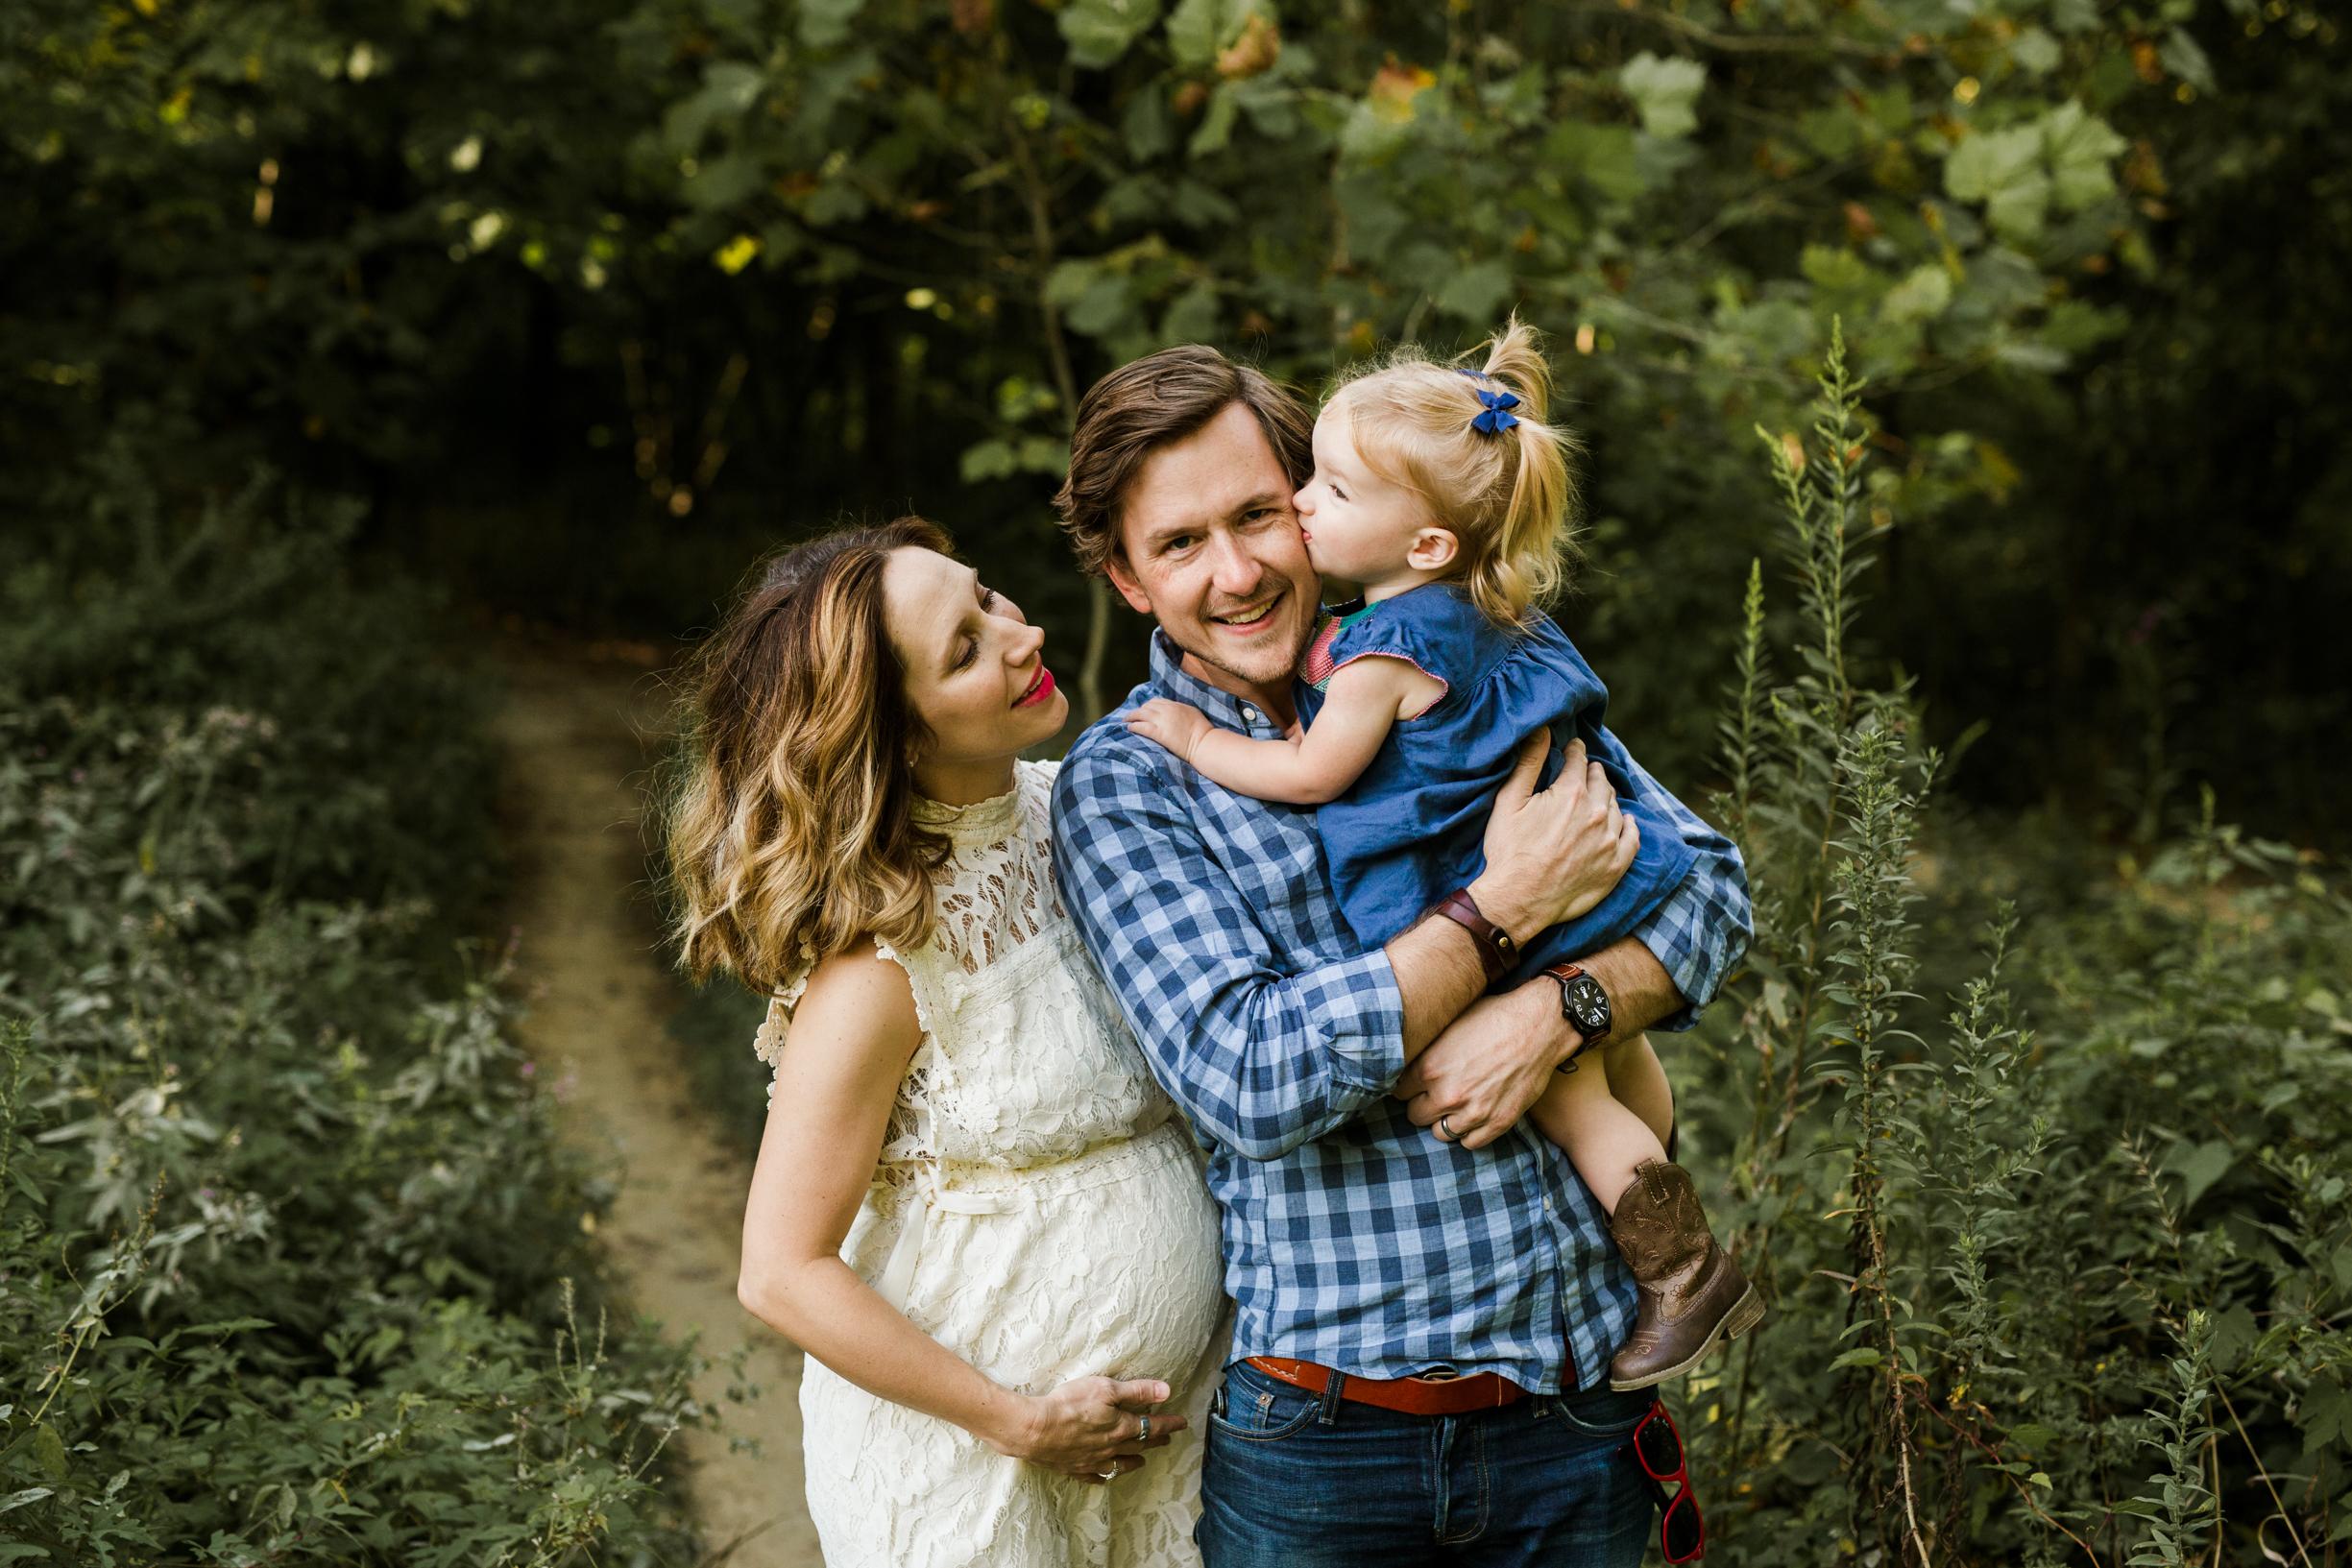 Disney Family 2017 (baby bump) WEBSITE Crystal Ludwick Photo (16 of 68).jpg